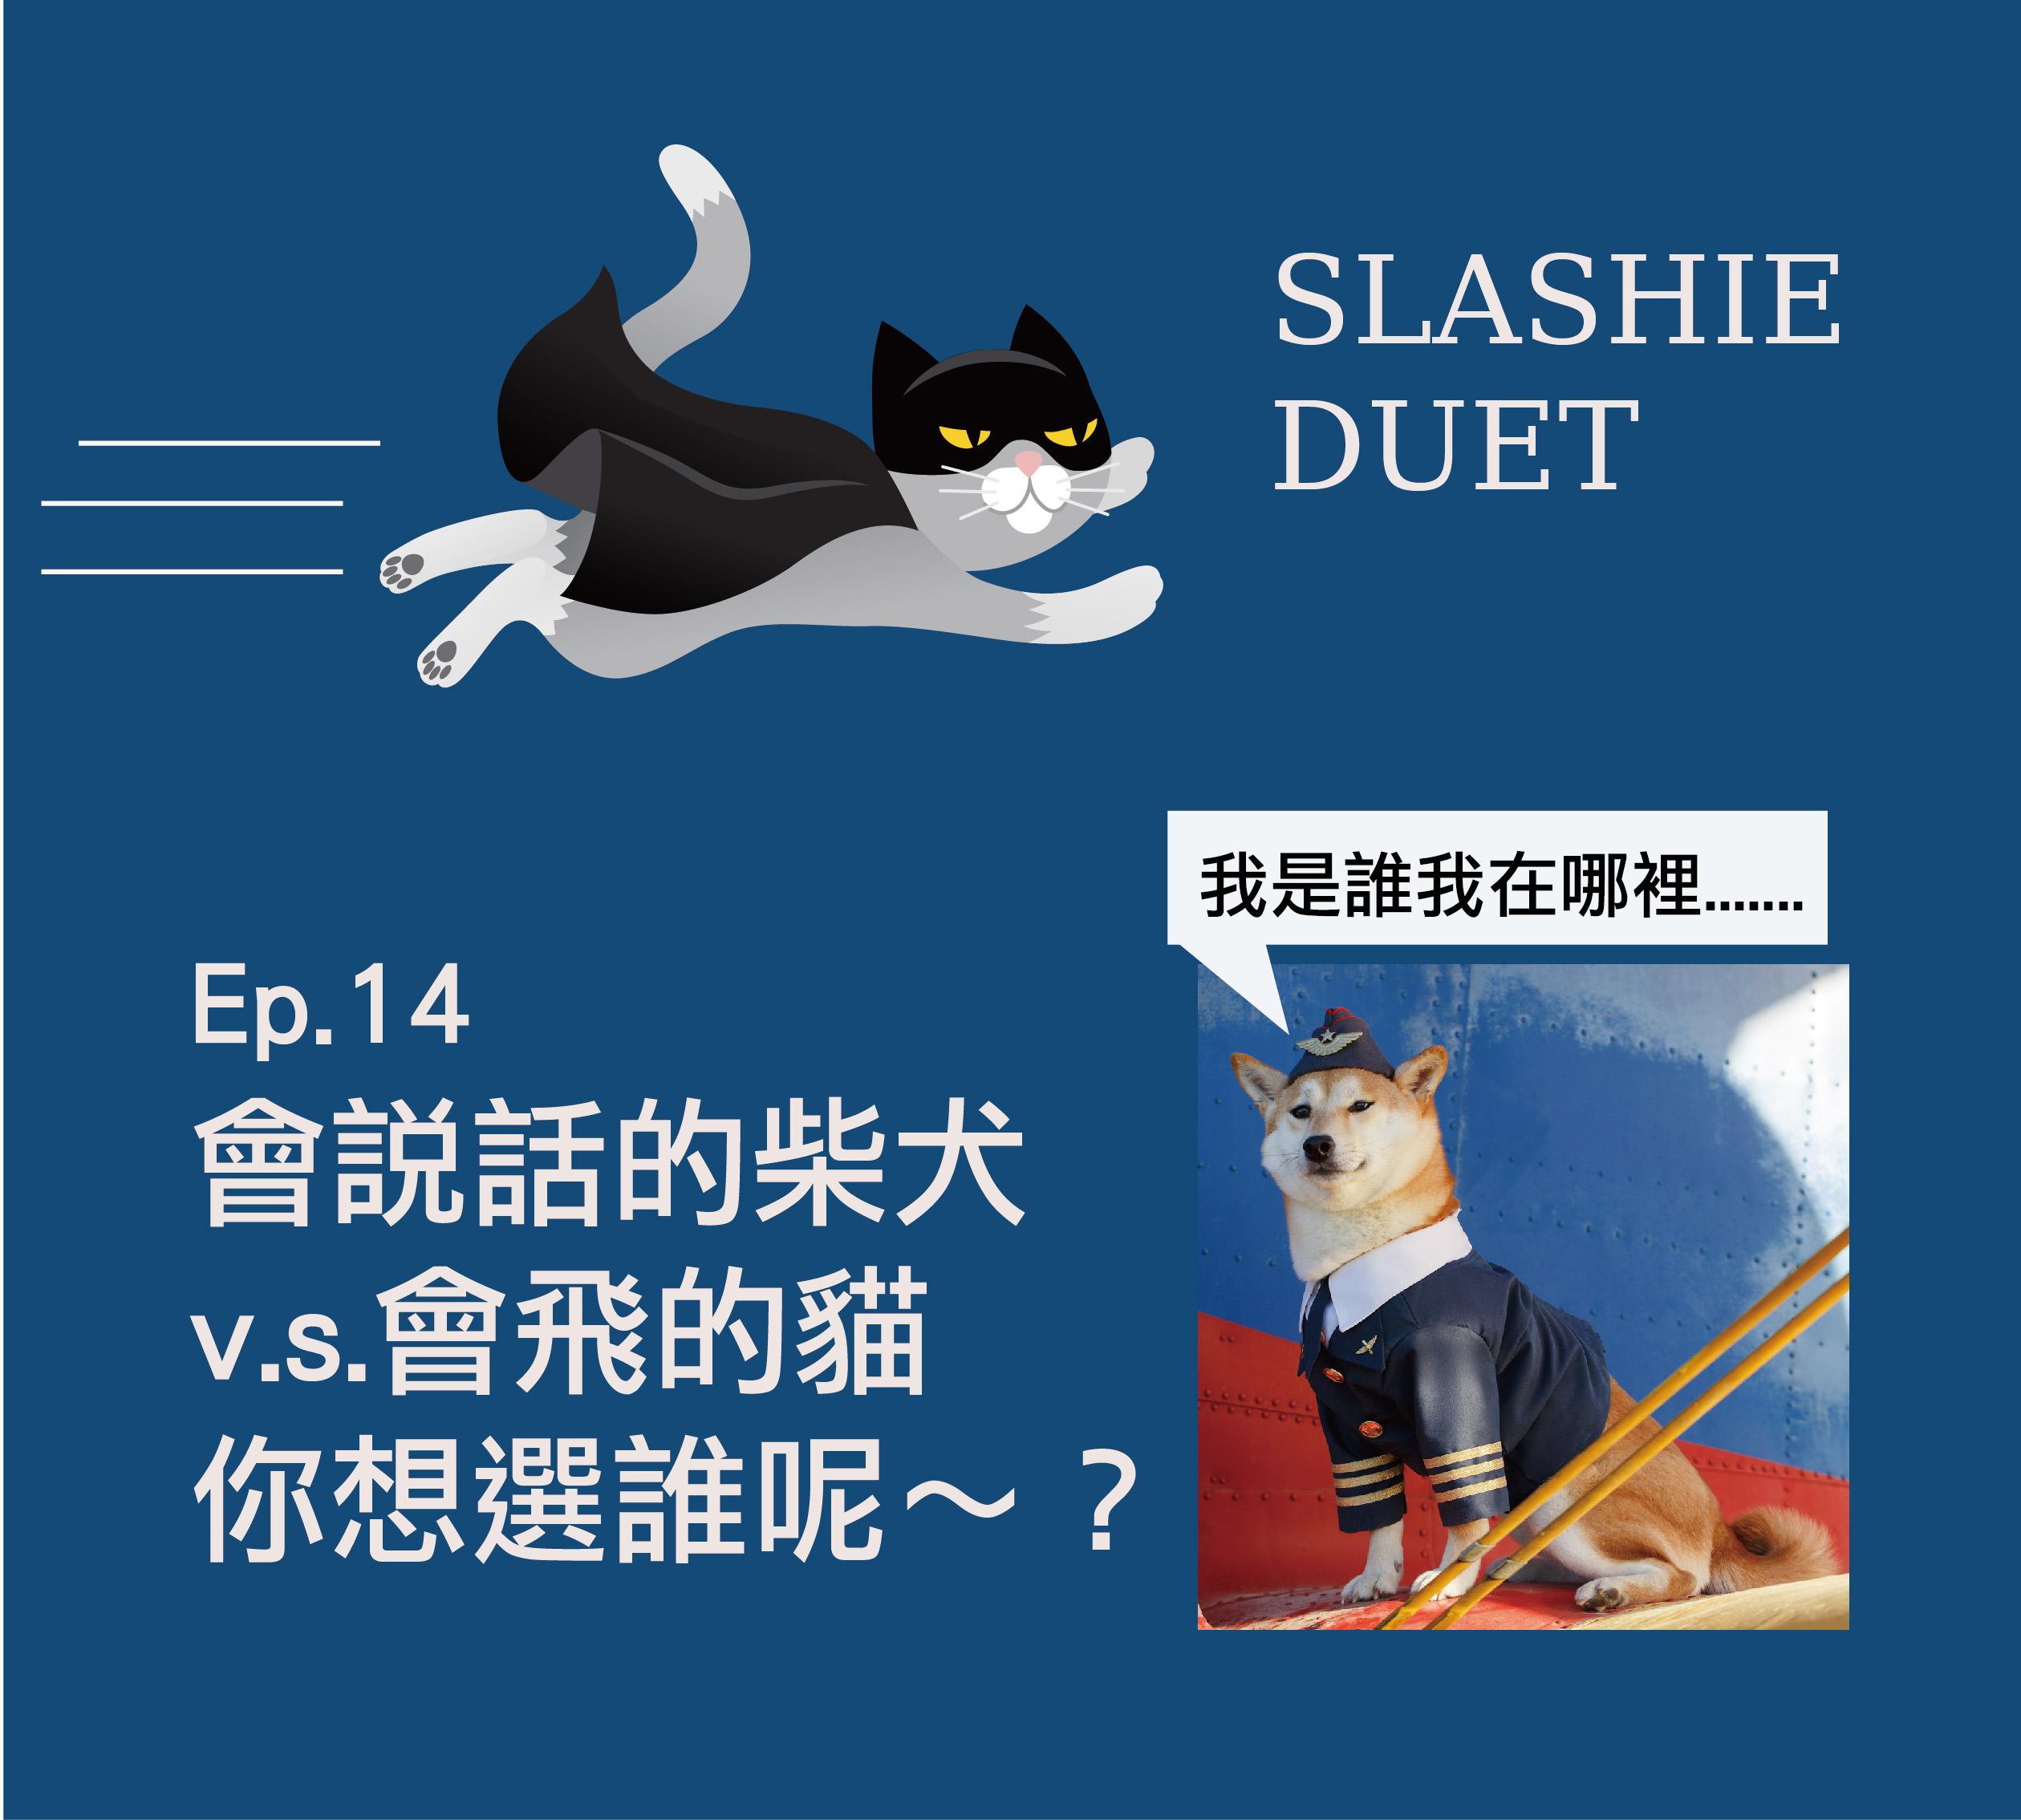 Ep14. 《隨便玩玩》會說話的柴犬與會飛的貓咪,你想選誰呢?(有本慎入?)